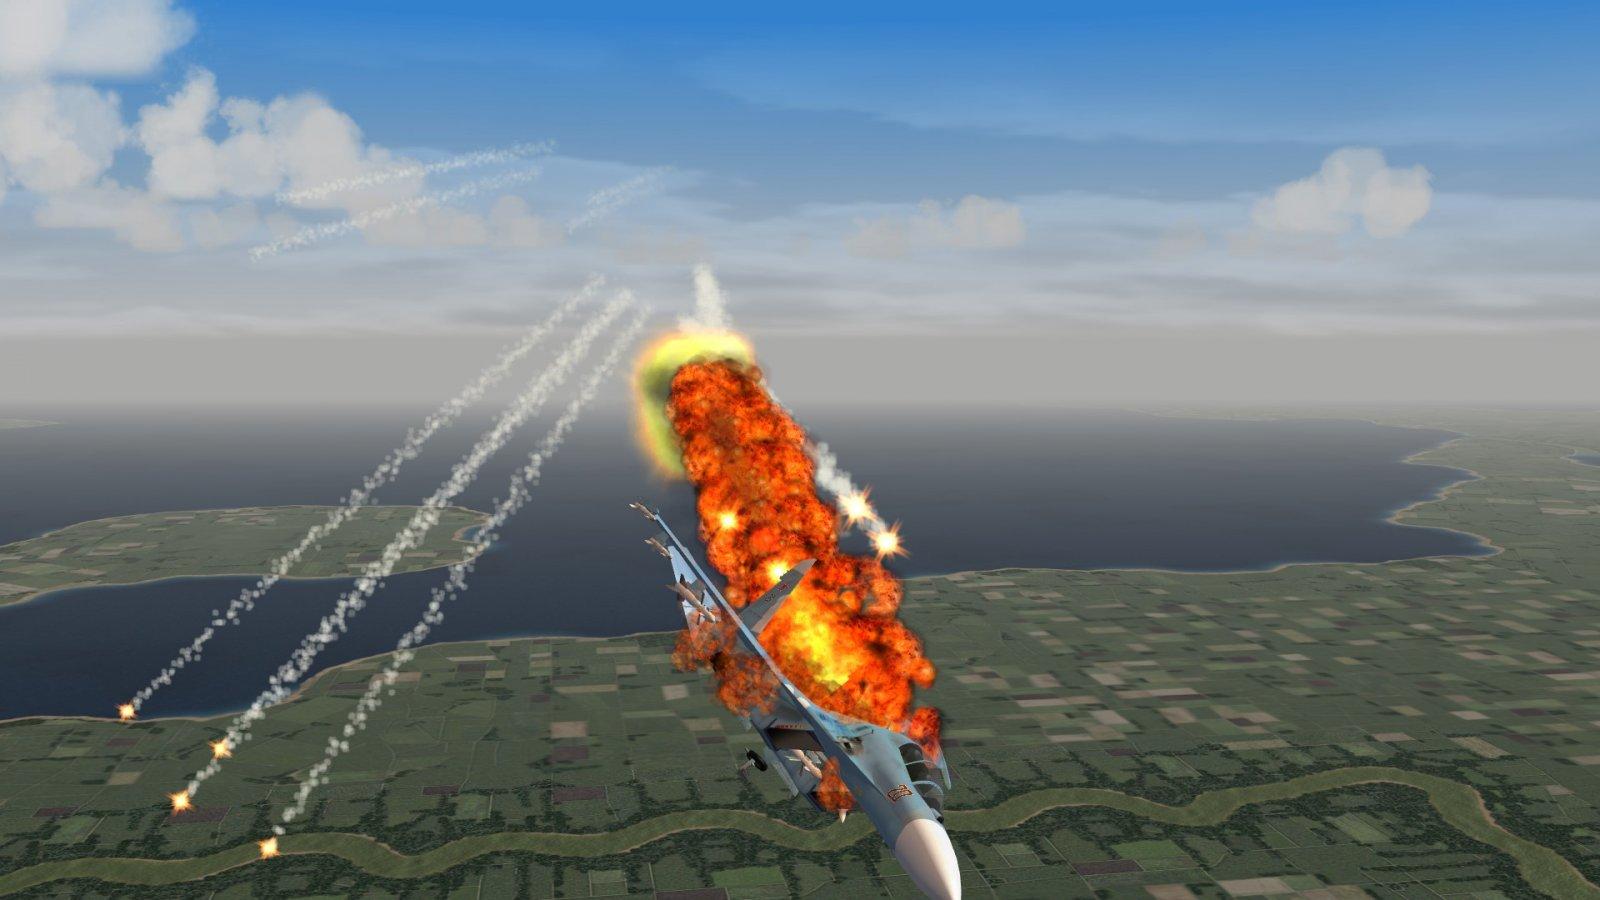 Gee, Flares Didn't Work, eh?